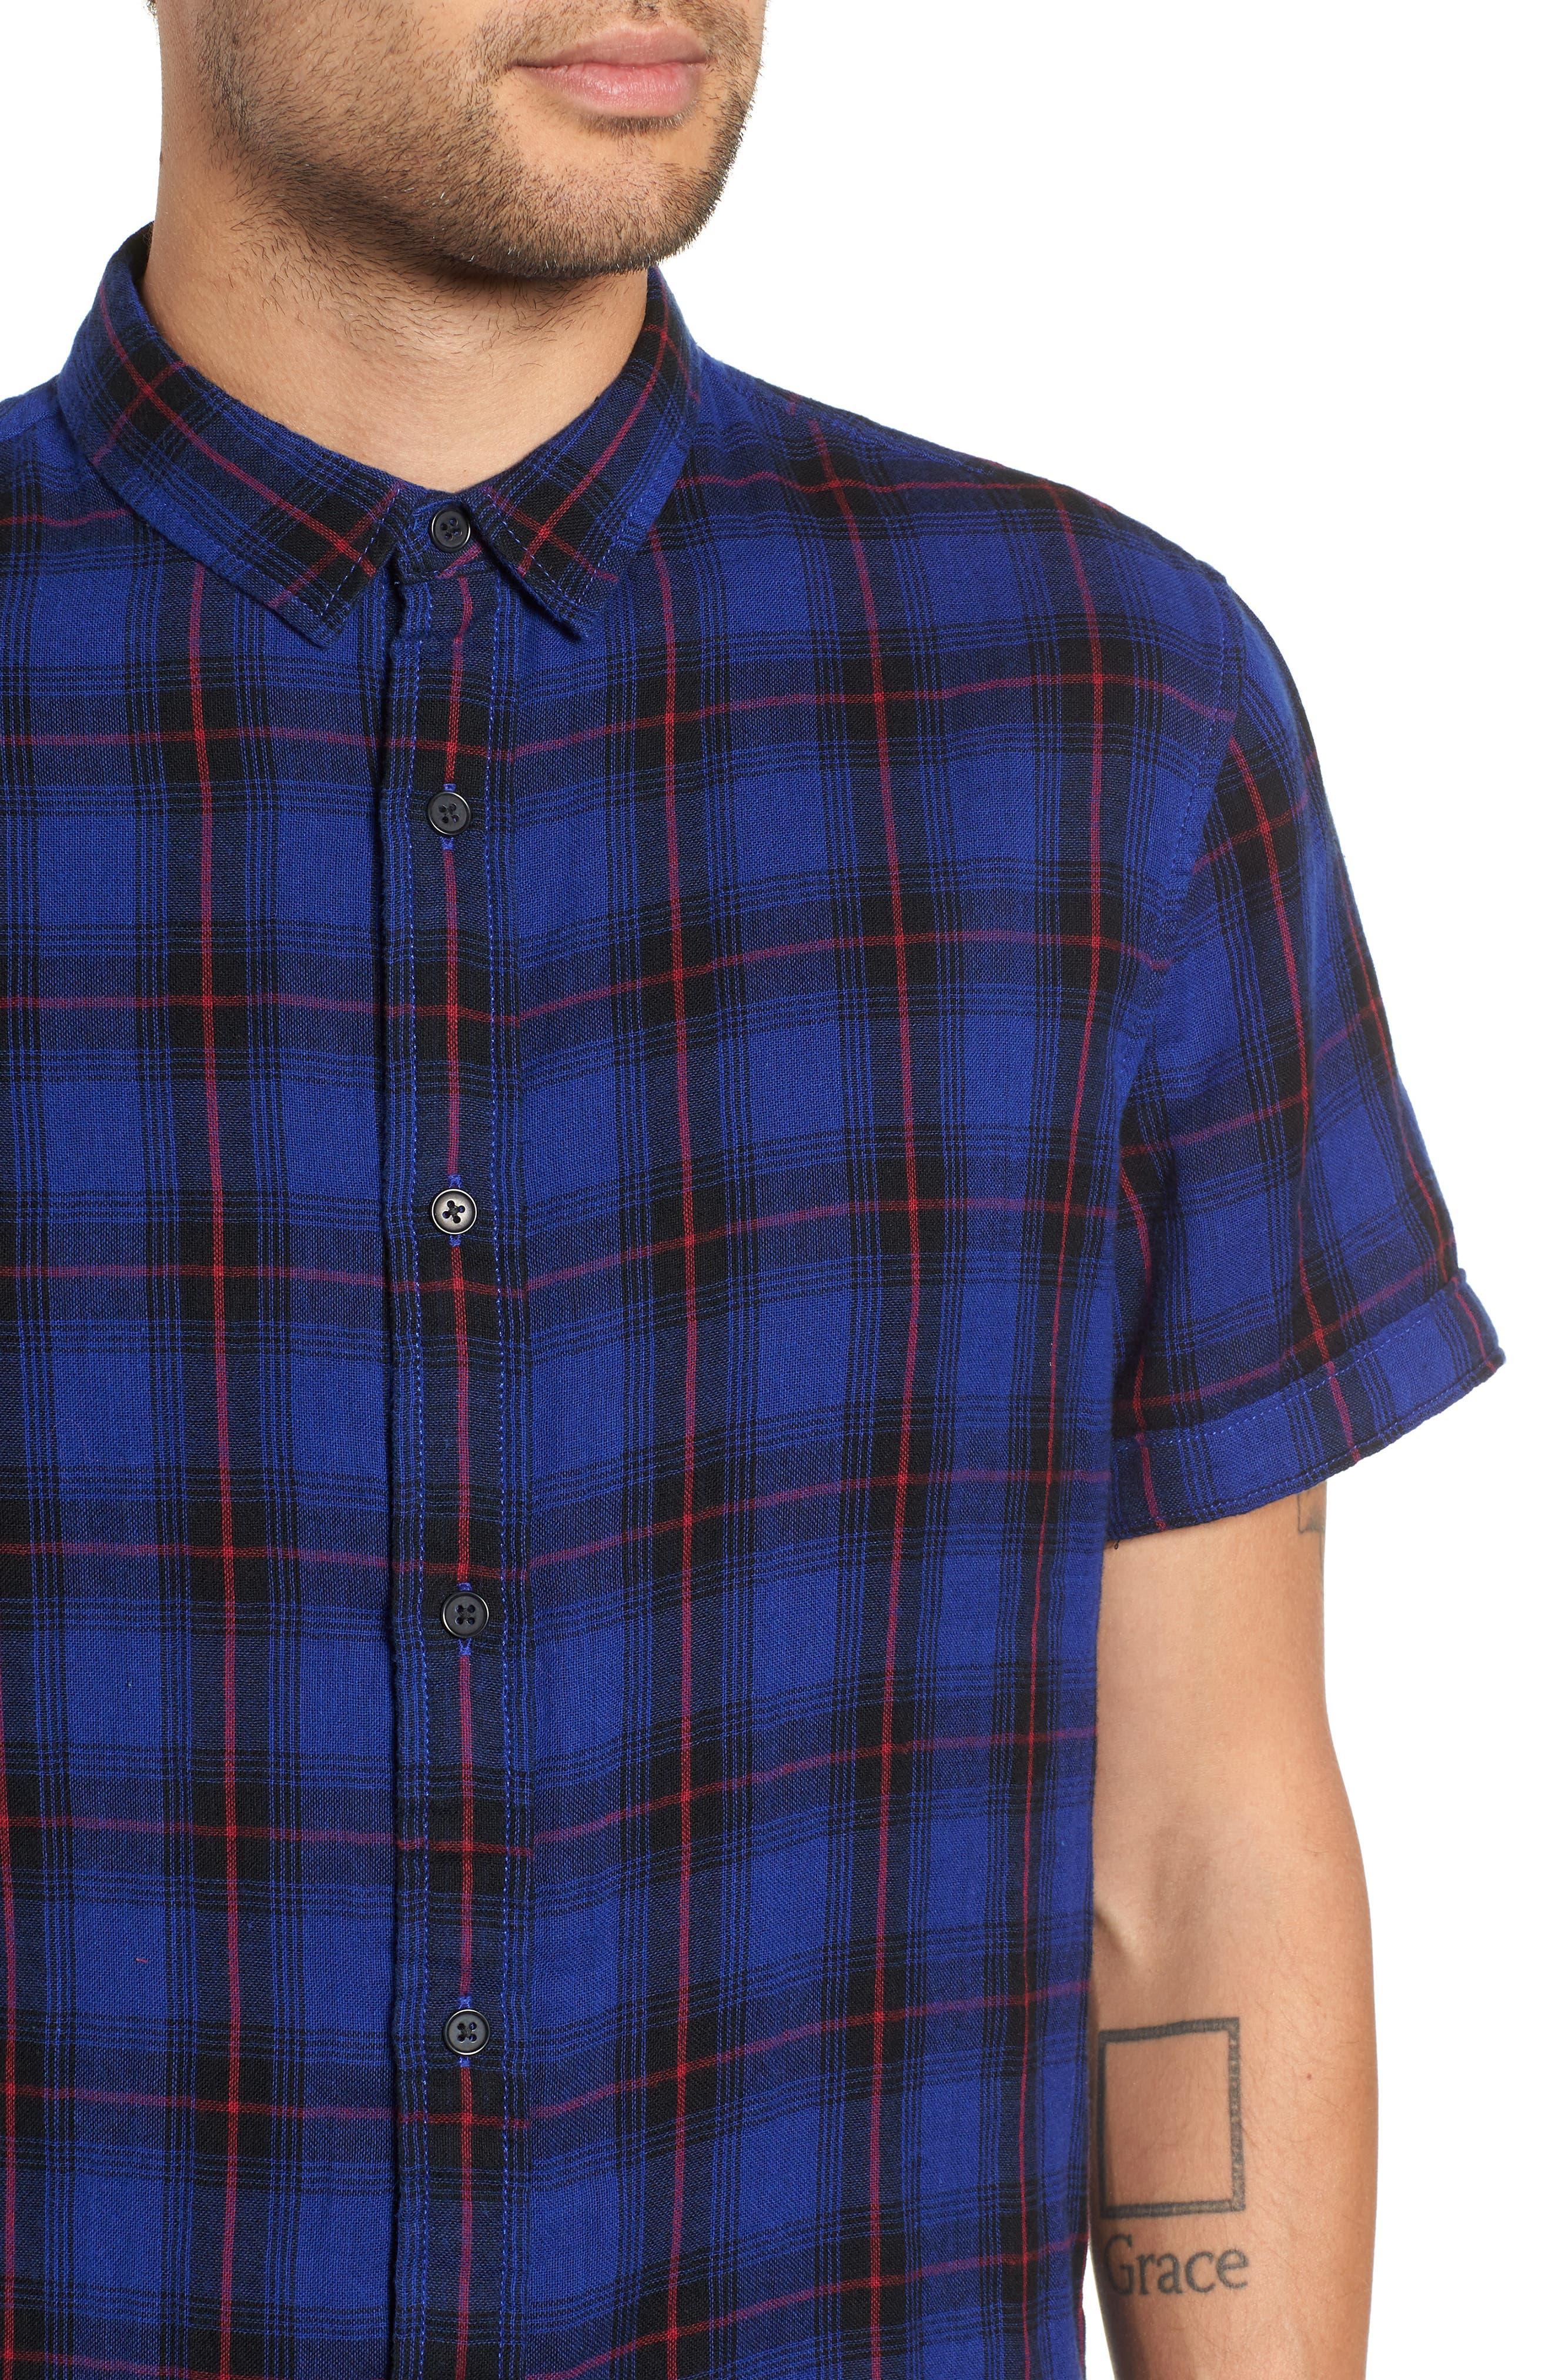 Plaid Woven Shirt,                             Alternate thumbnail 4, color,                             BLUE BLACK LUCA PLAID